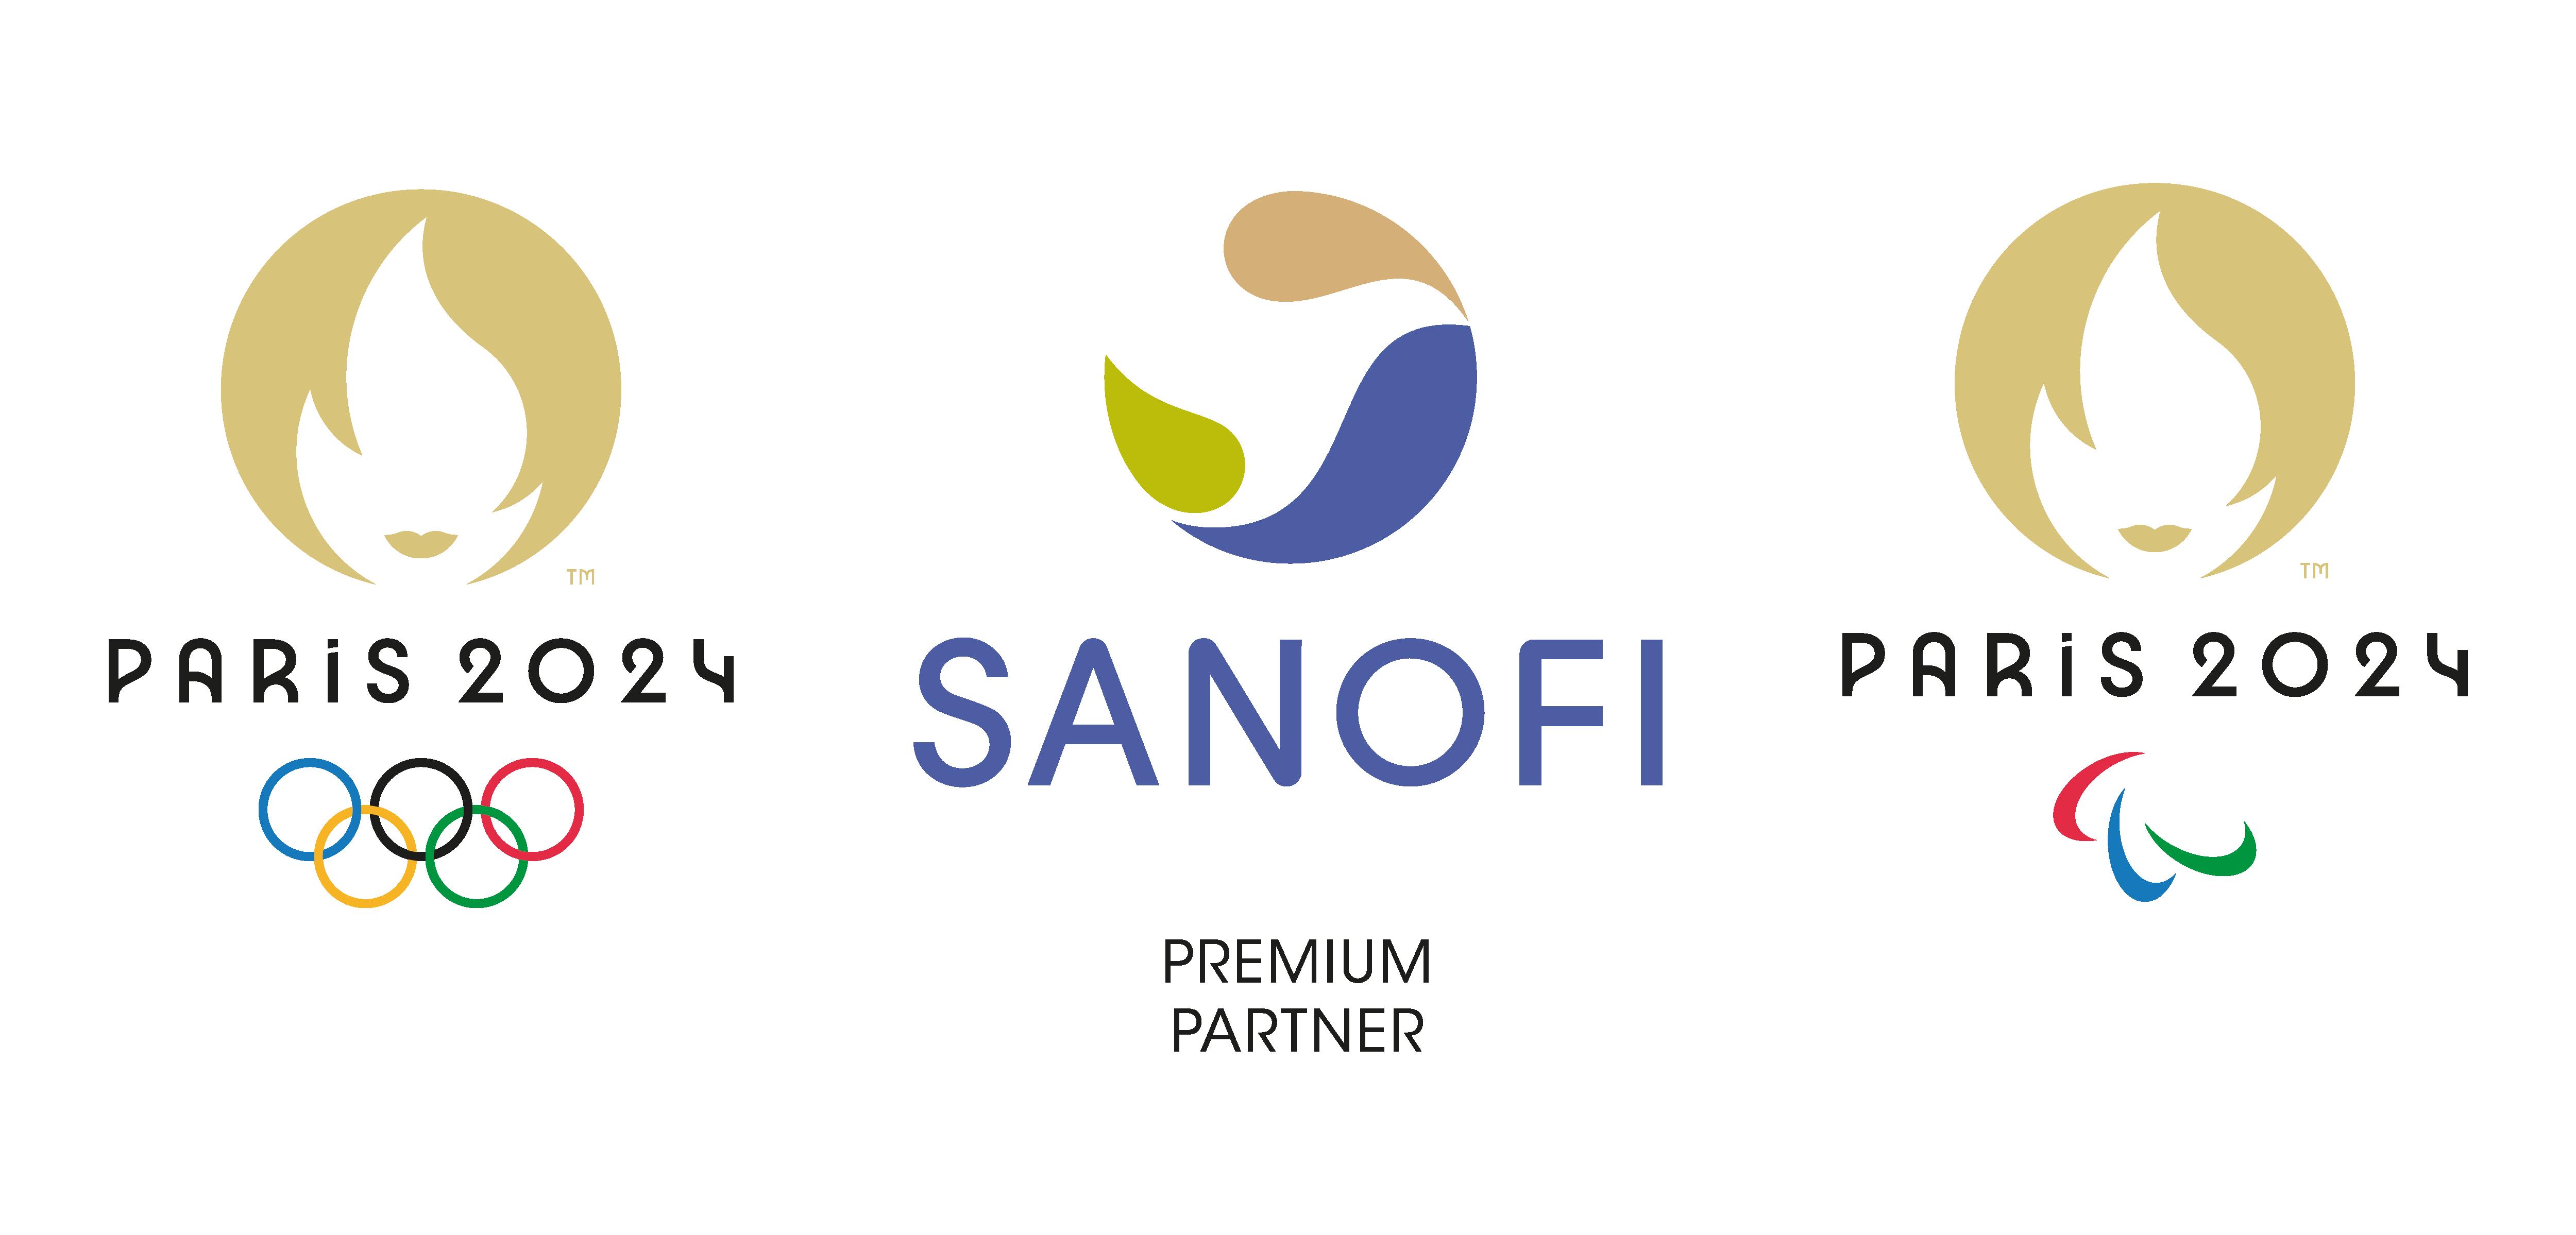 Sanofi announces Paris 20 Premium partnership for the